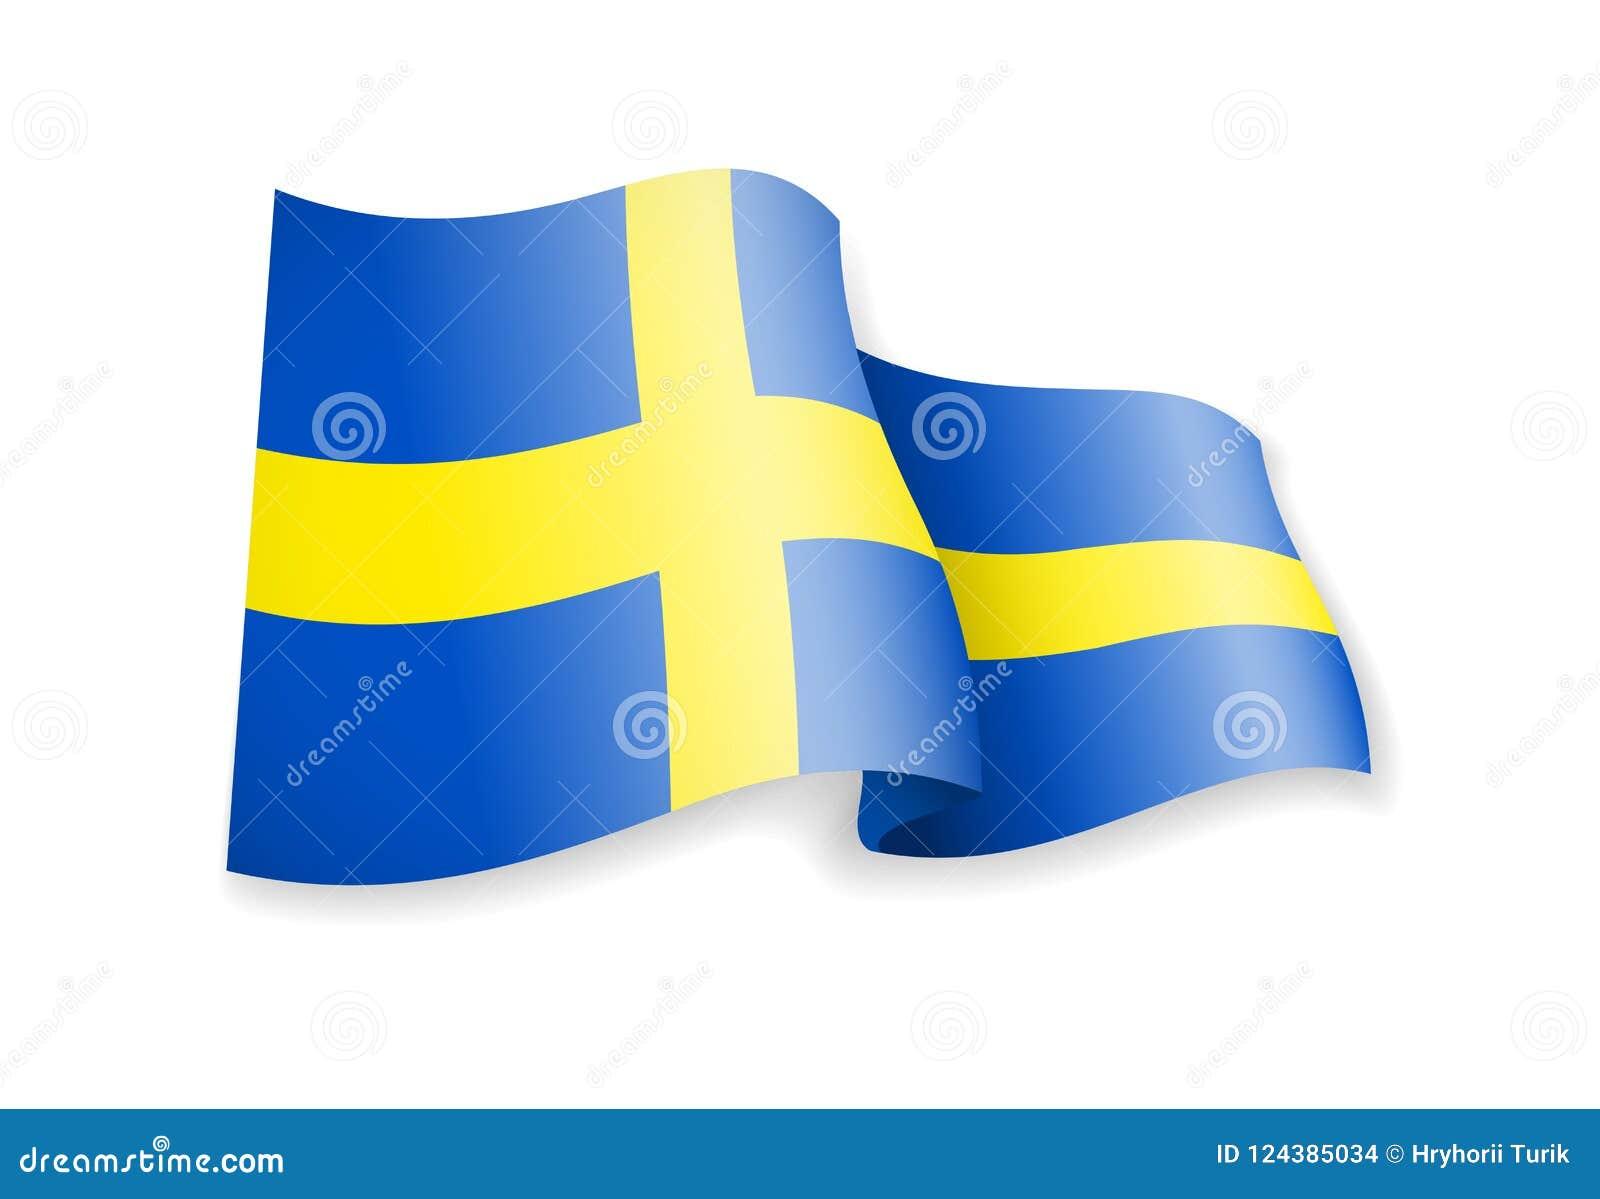 Waving Sweden flag on white background.